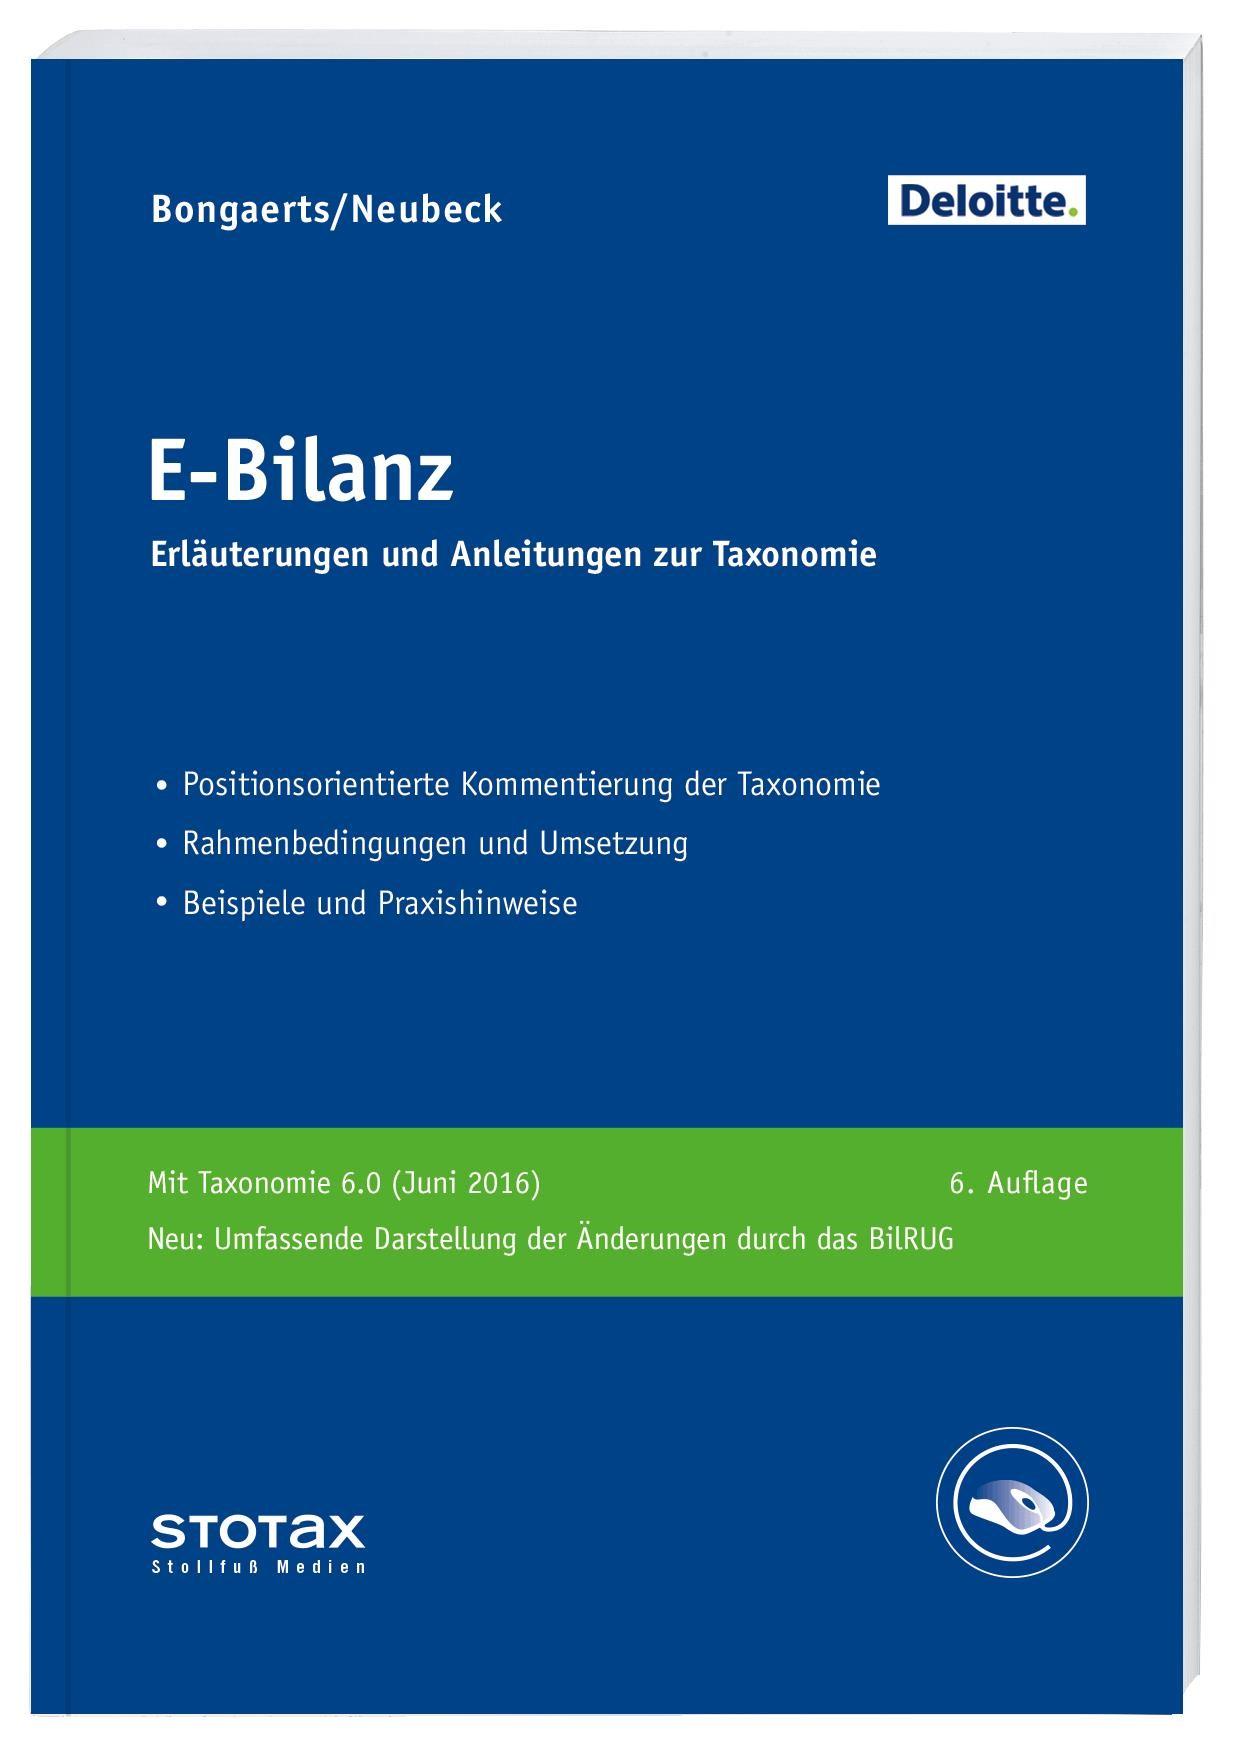 E-Bilanz • Online | Bongaertz / Neubeck, 2011 (Cover)